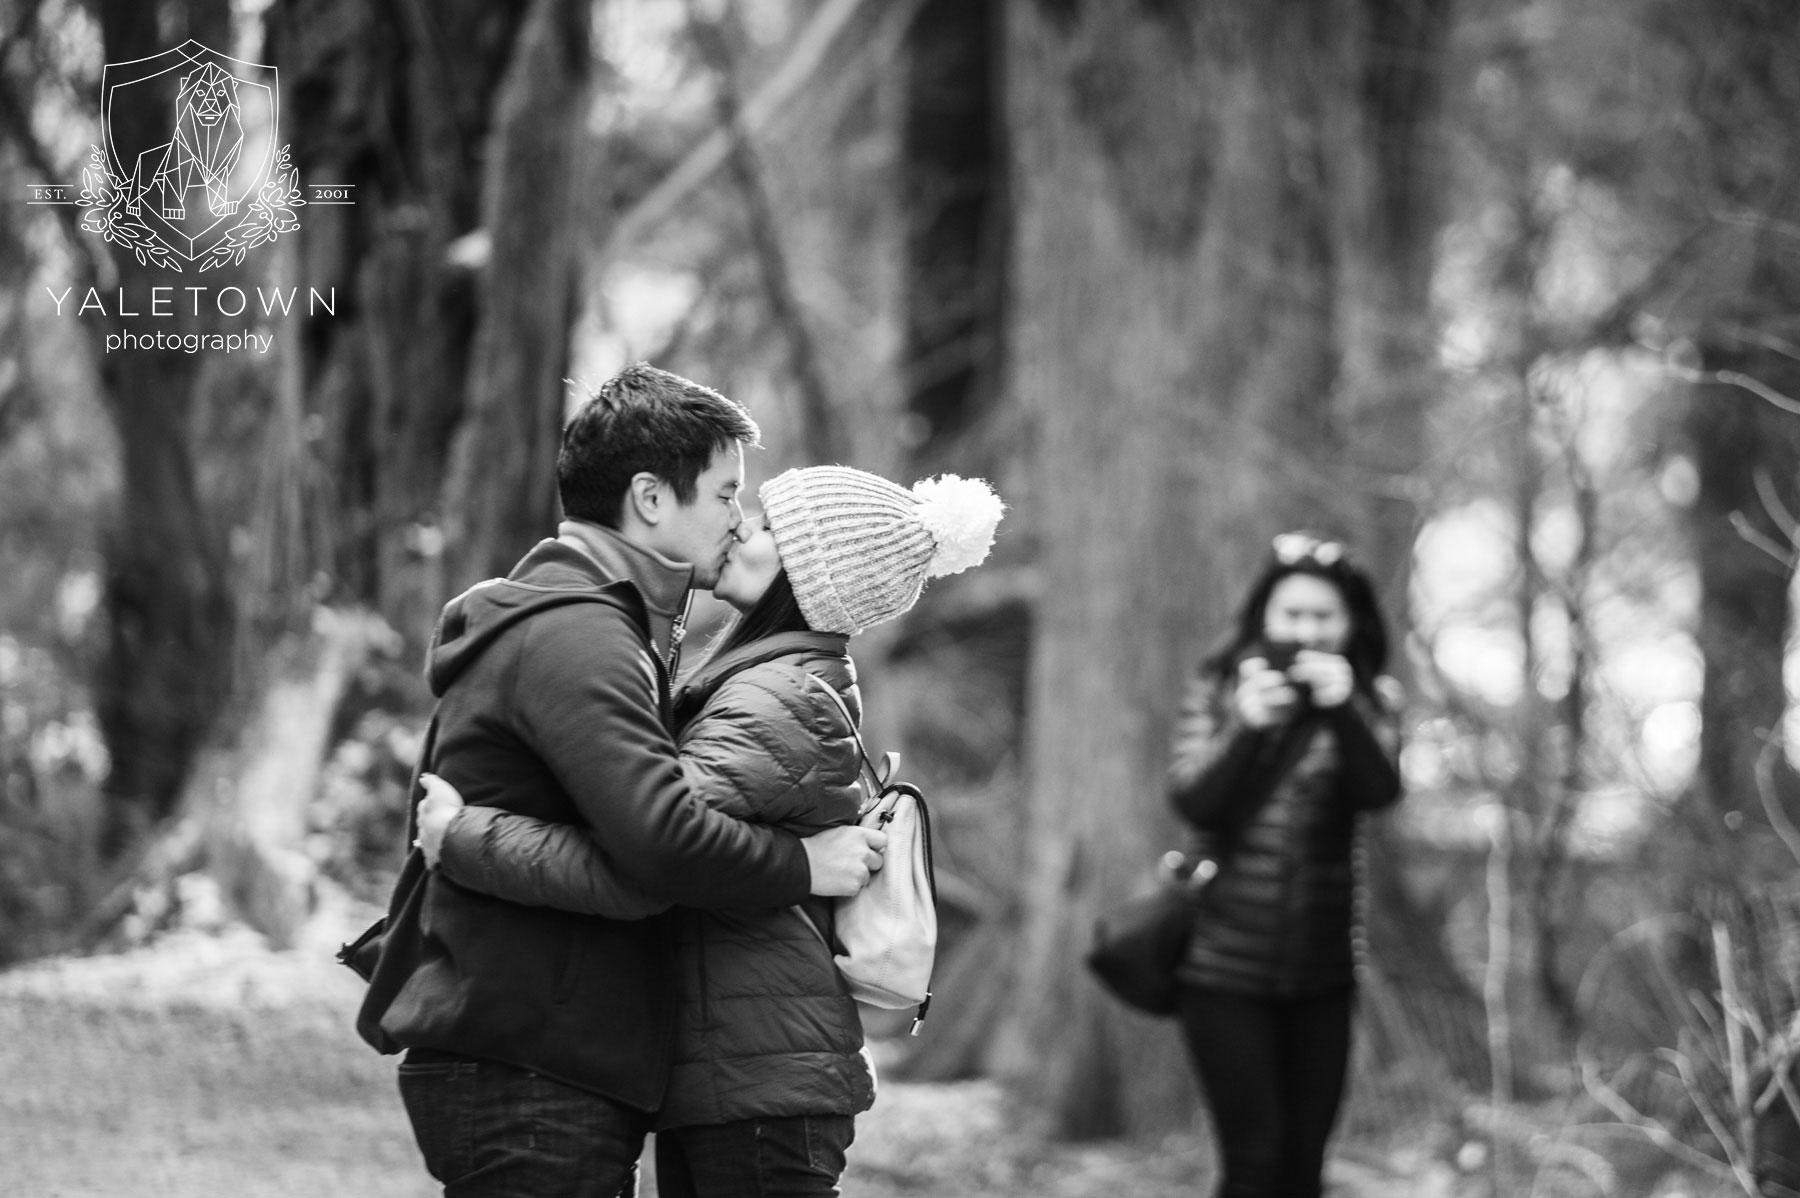 Wedding-Proposal-Vancouver-Stanley-Park-Wedding-Photographer-Vancouver-Yaletown-Photography-Photo-12.JPG